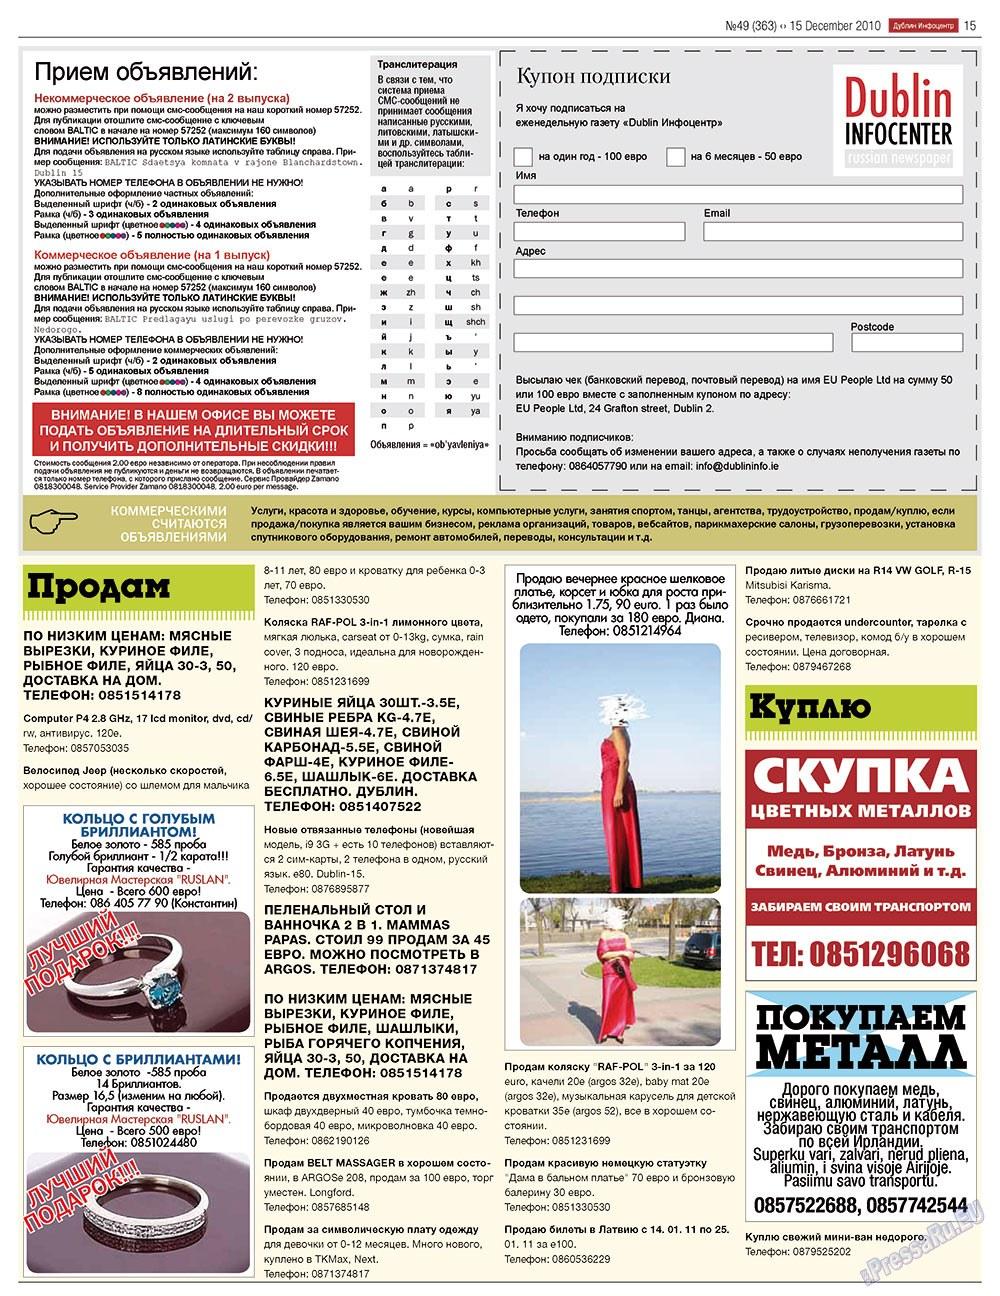 Дублин инфоцентр (газета). 2010 год, номер 49, стр. 15